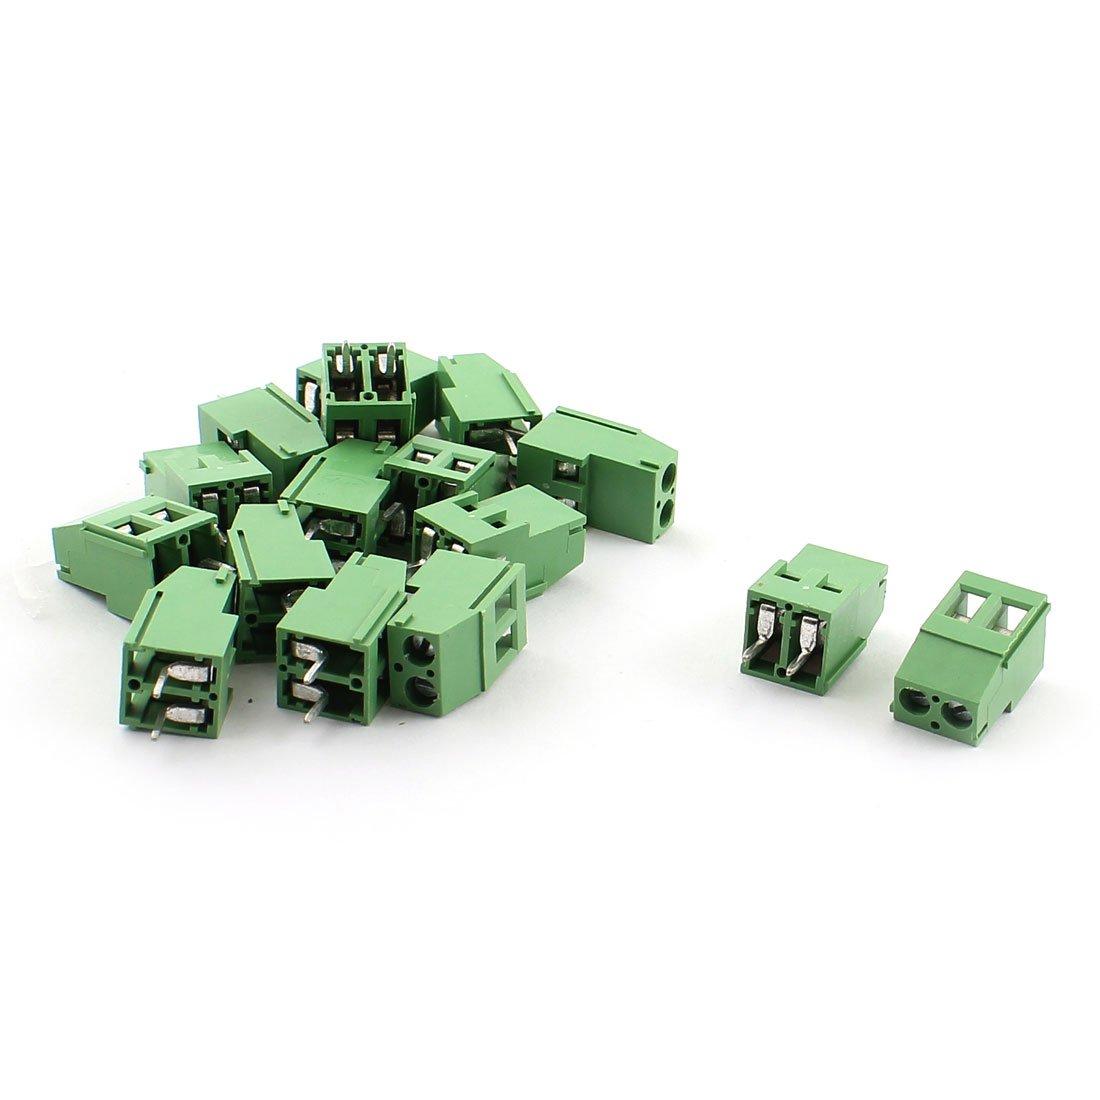 uxcell 15Pcs HG129-5.08 2Pins 5.08mm Screw Terminal Barrier Blocks 300V 20A